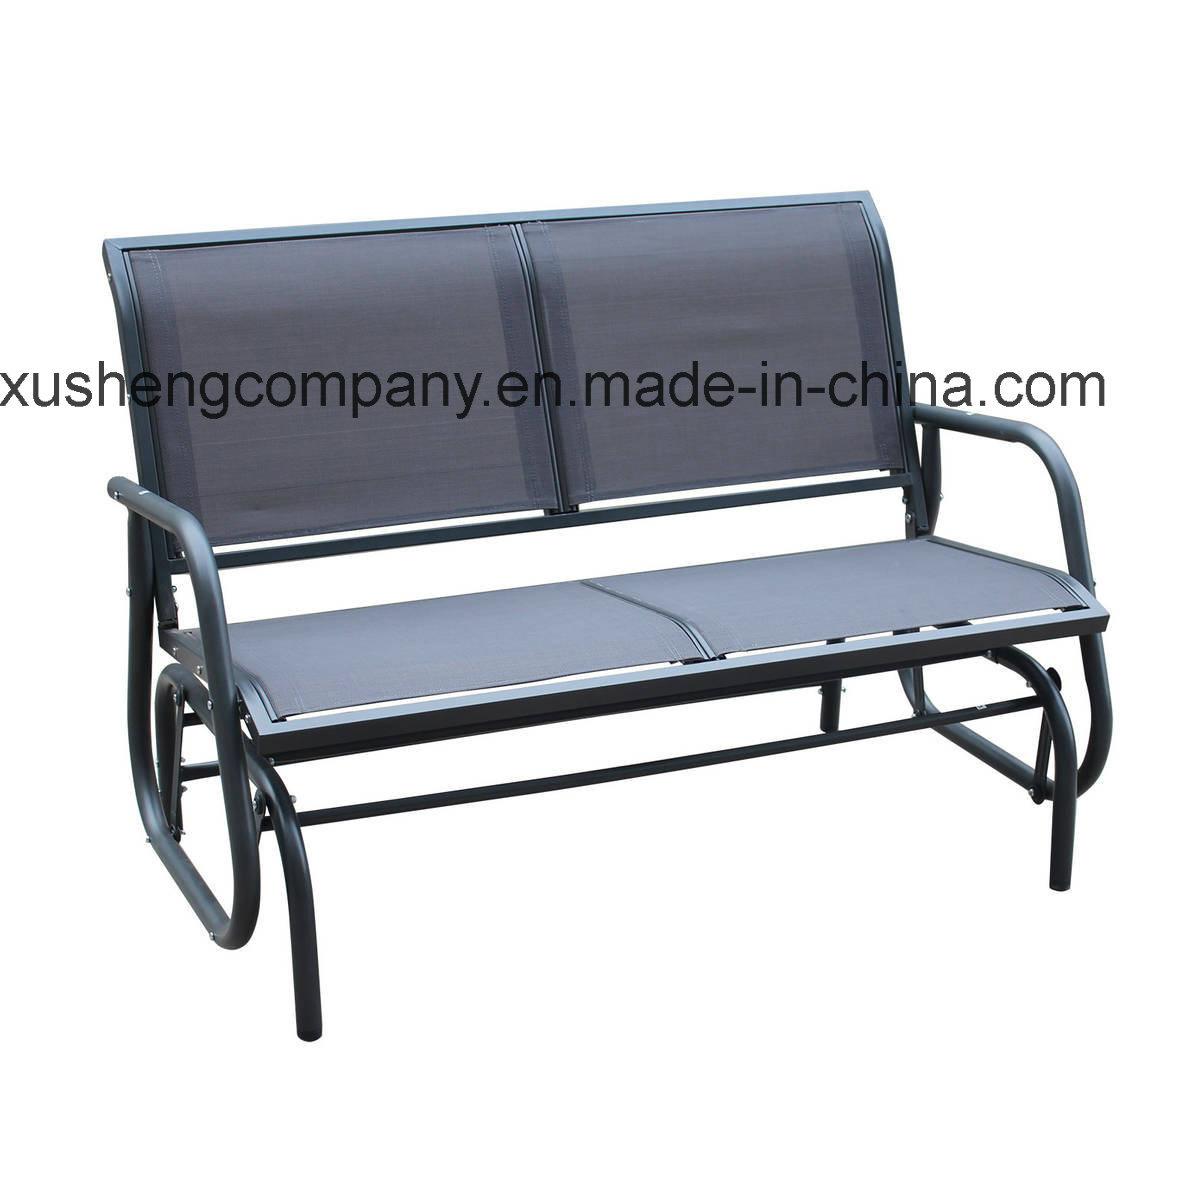 Excellent China Outdoor Metal Legs 2 Seater Garden Bench Photos Beatyapartments Chair Design Images Beatyapartmentscom